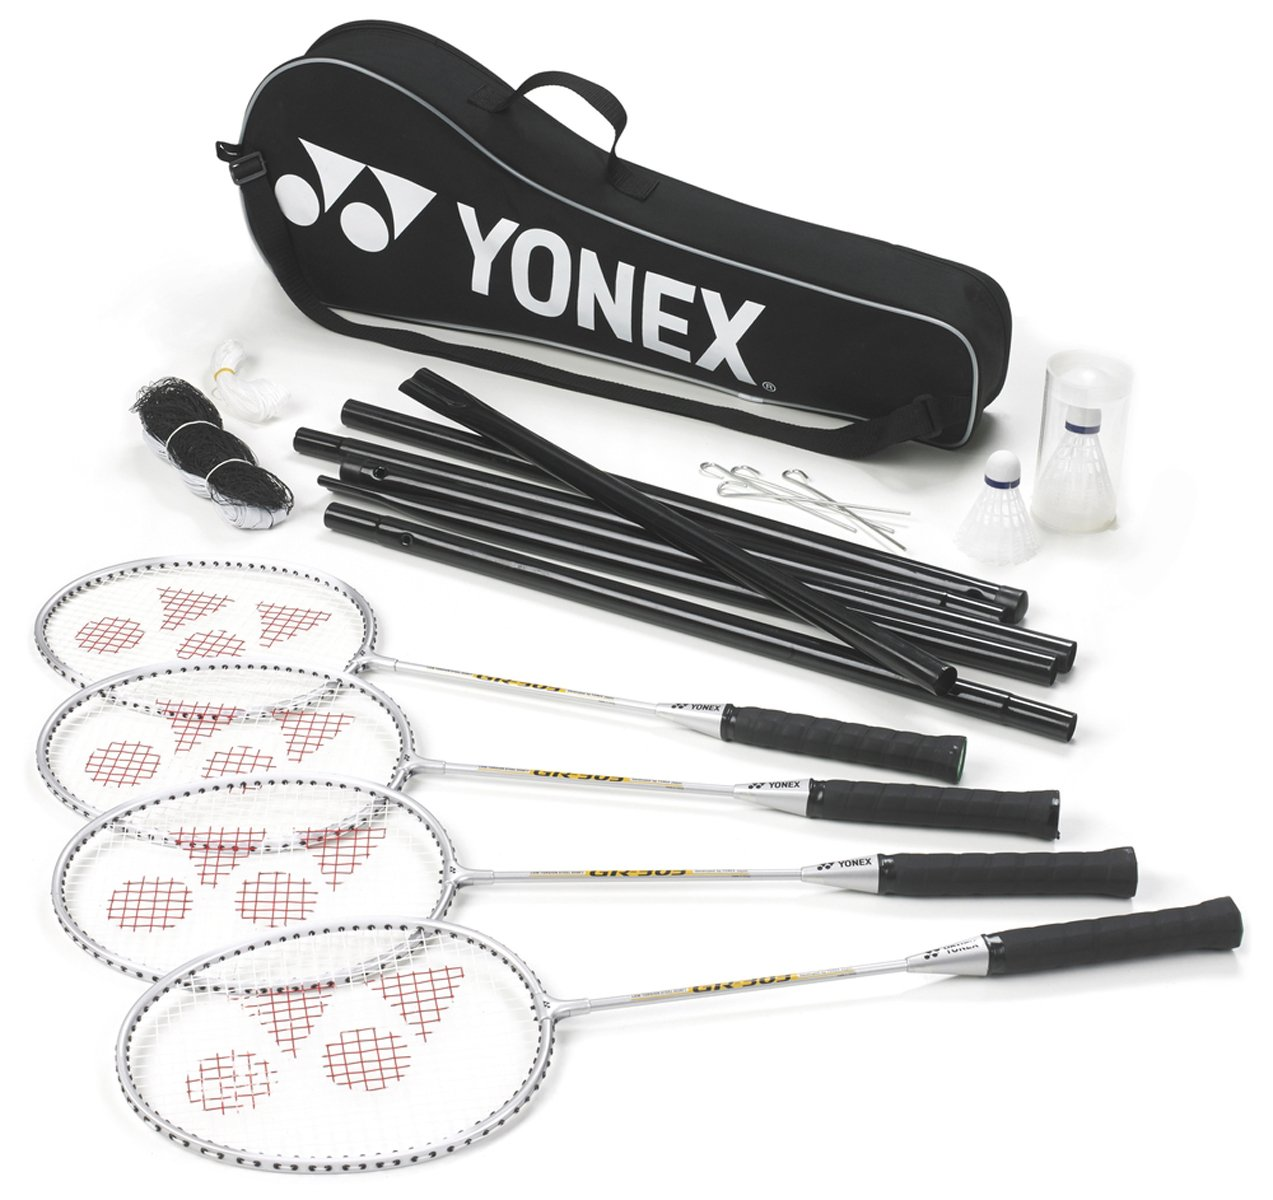 Yonex Badminton Sports 4 Player Set (racket,shuttles,net,post,& Carry Bag) Only by Yonex (Image #1)